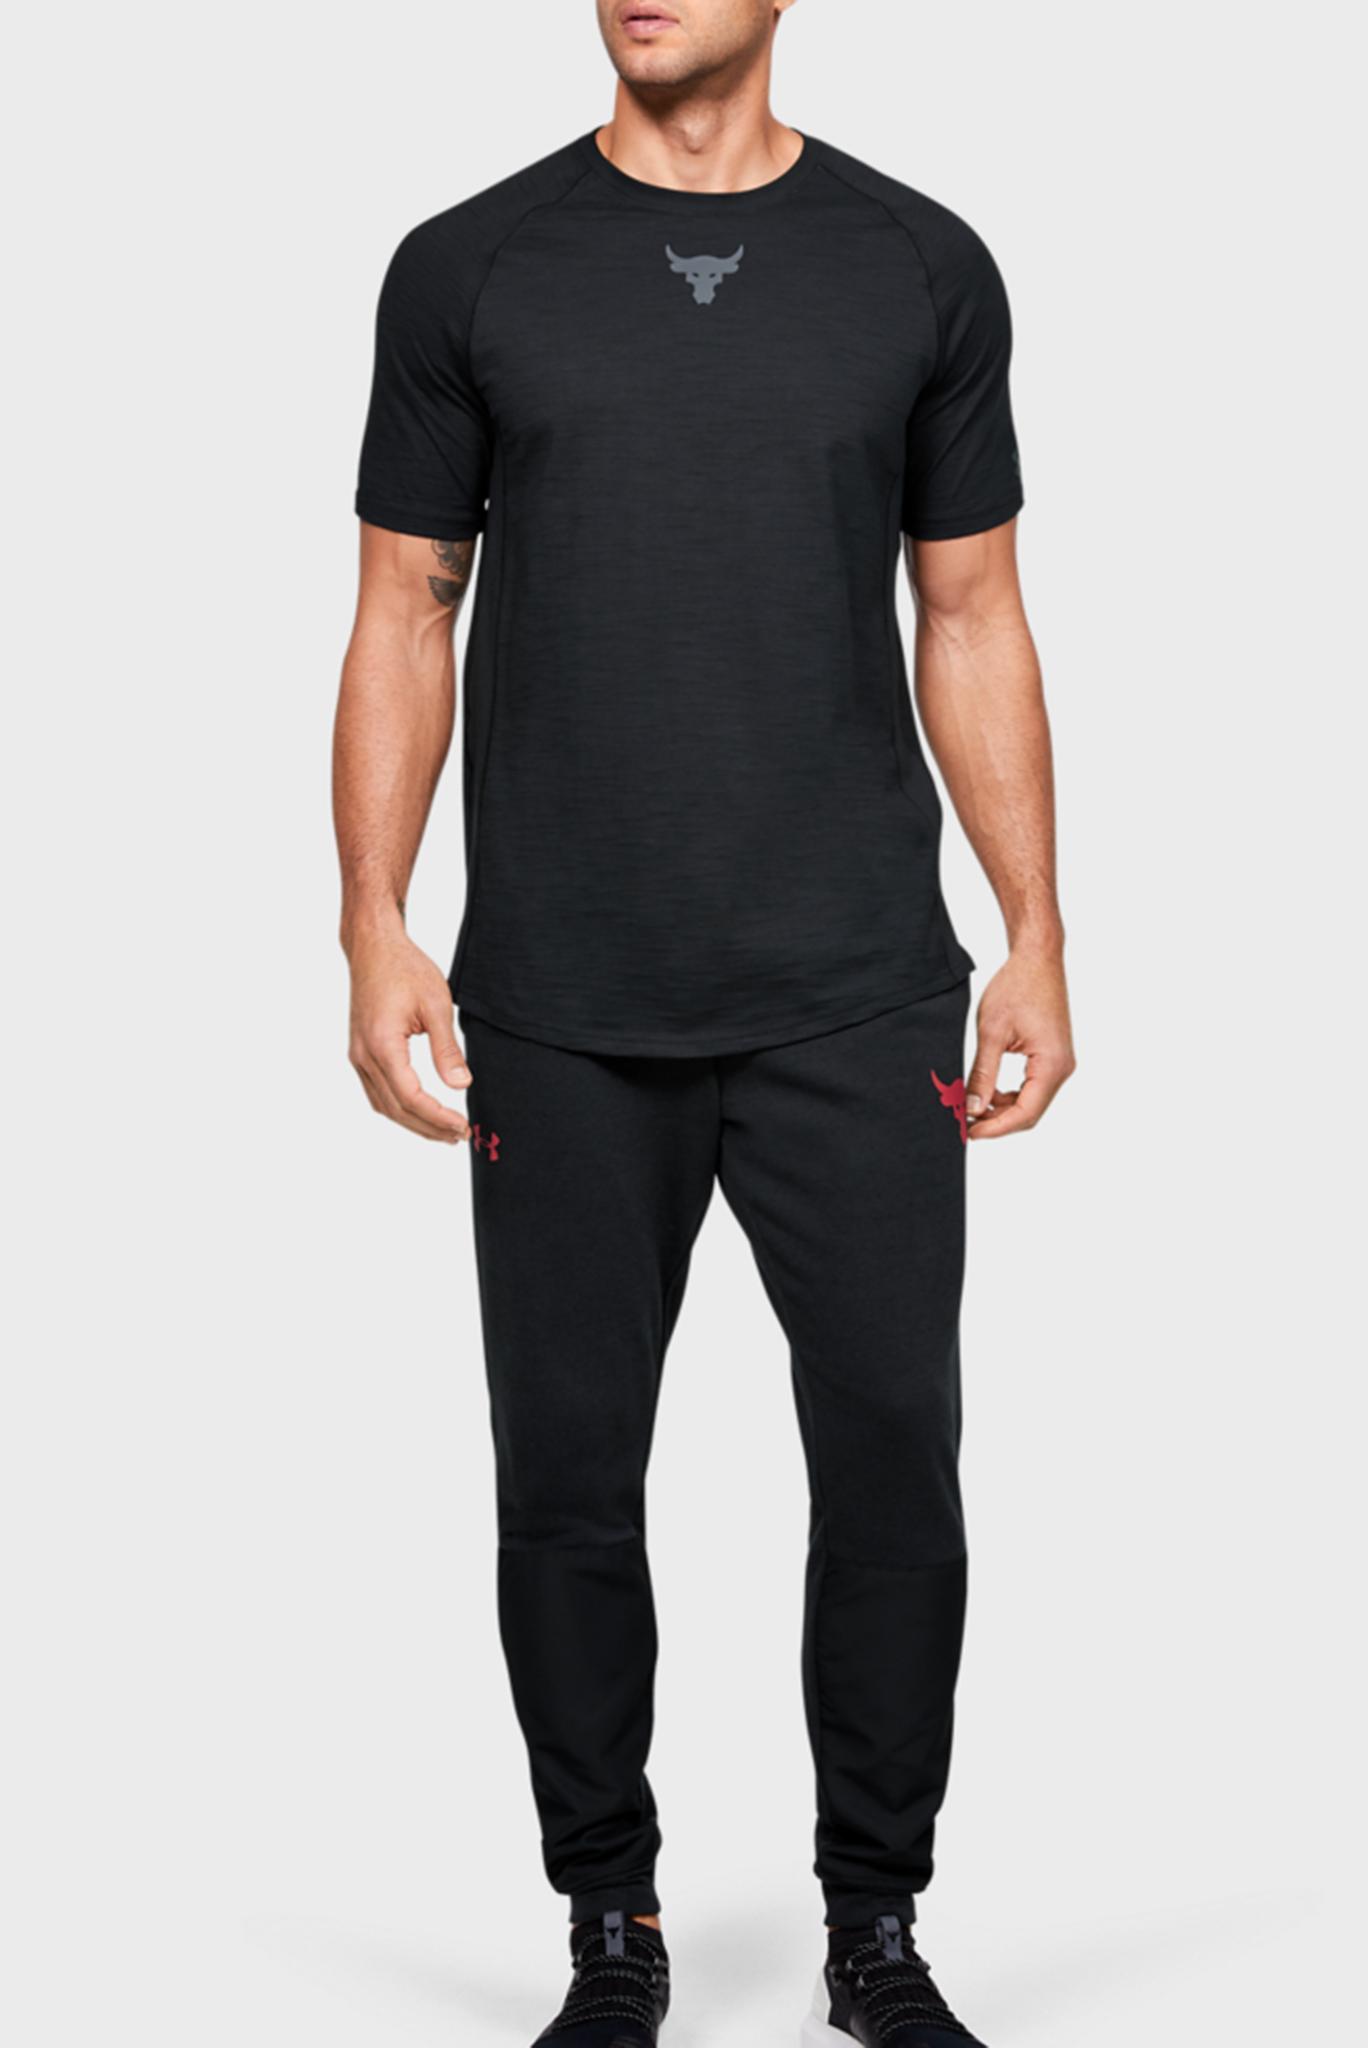 Мужская черная футболка Рroject Rock Charged Cotton SS Under Armour